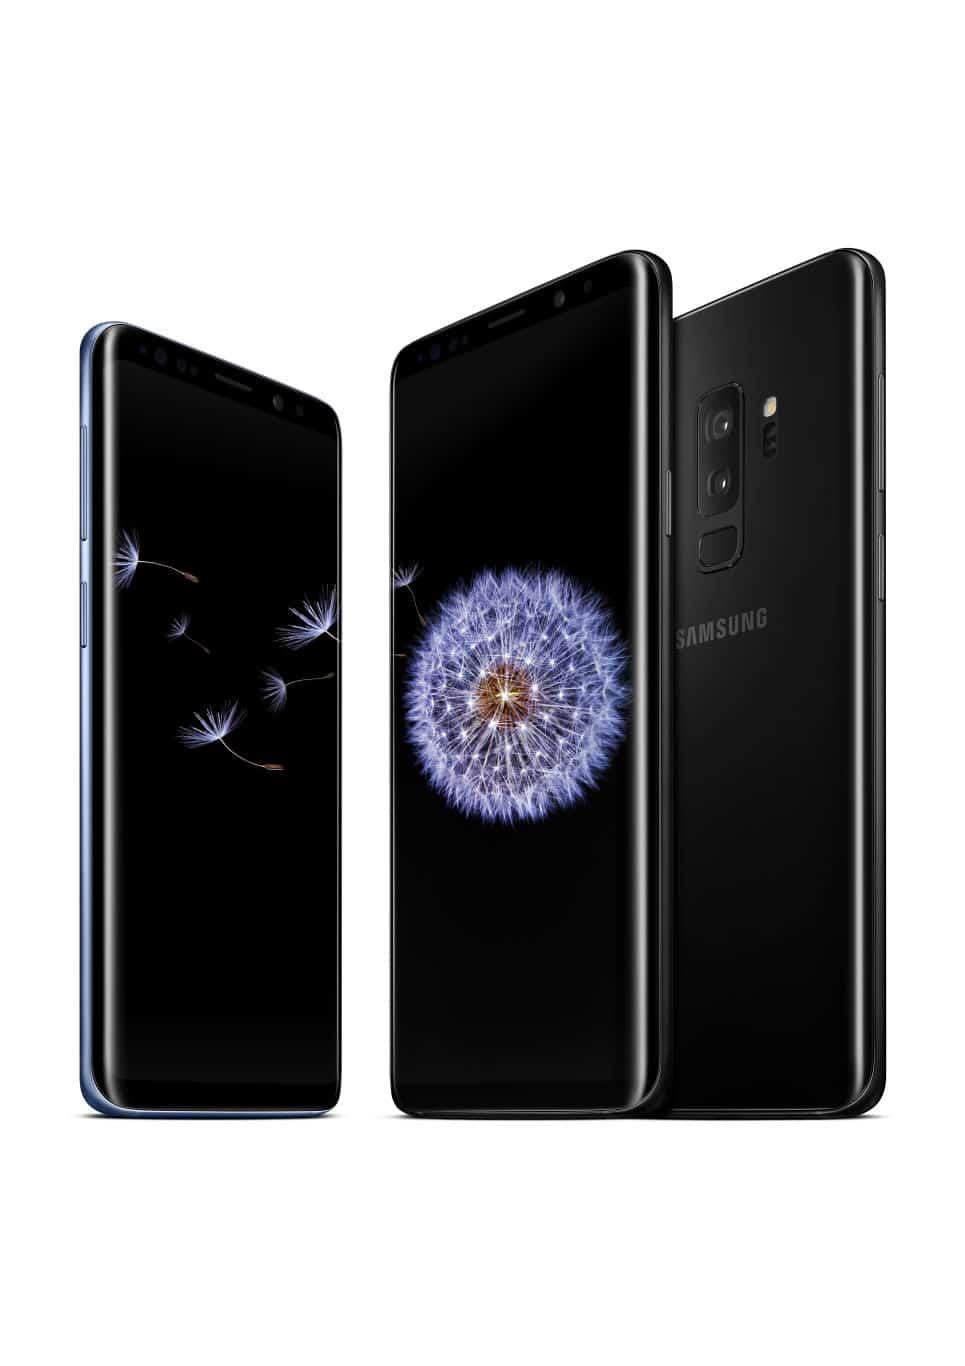 Samsung Galaxy S9 Plus Press 4